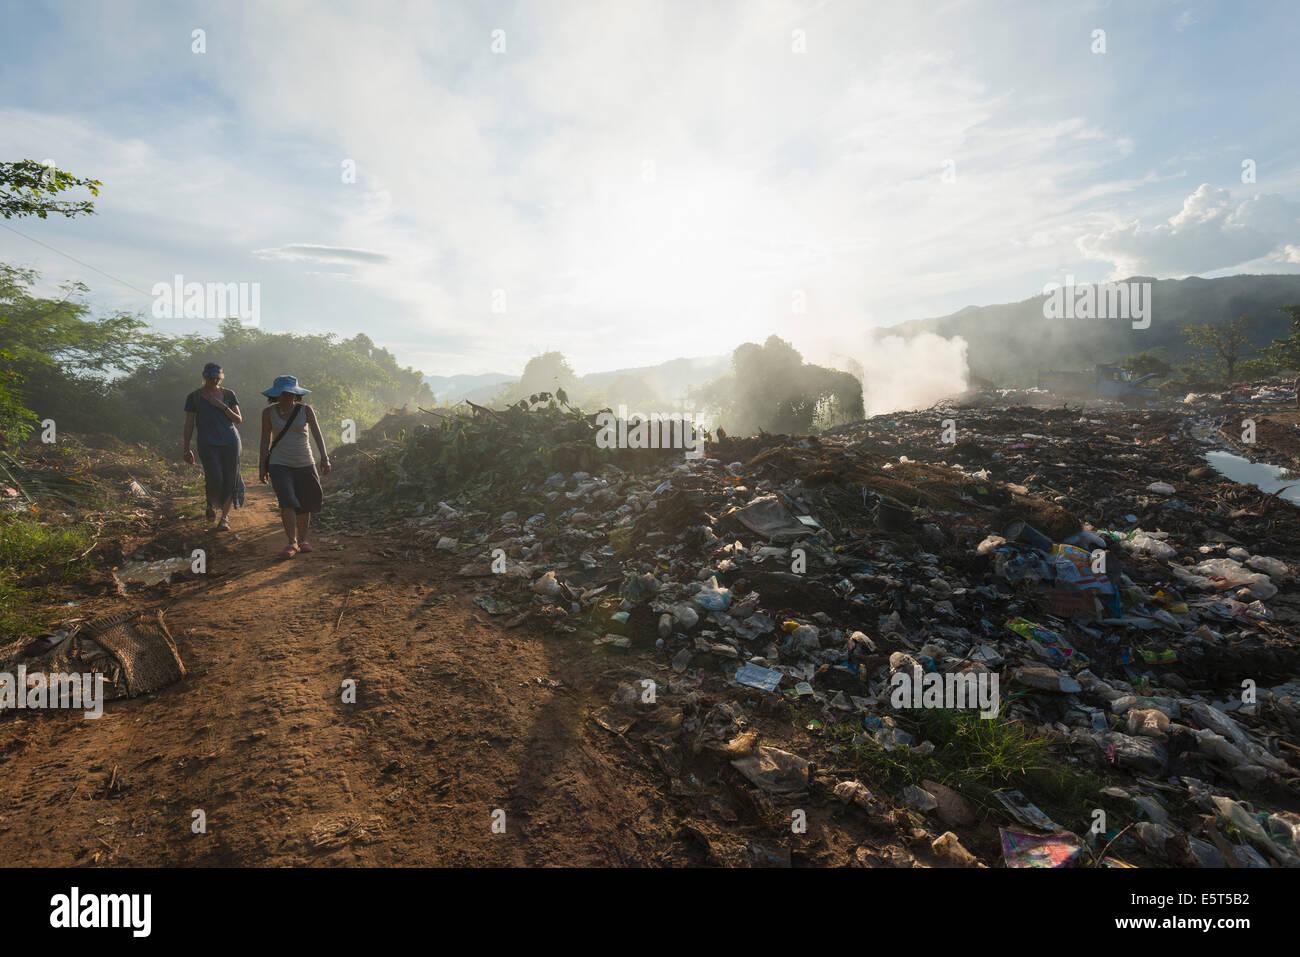 Südost-Asien, Myanmar (Burma), Müllkippe in Hsipaw Trekkinggebiet Stockbild